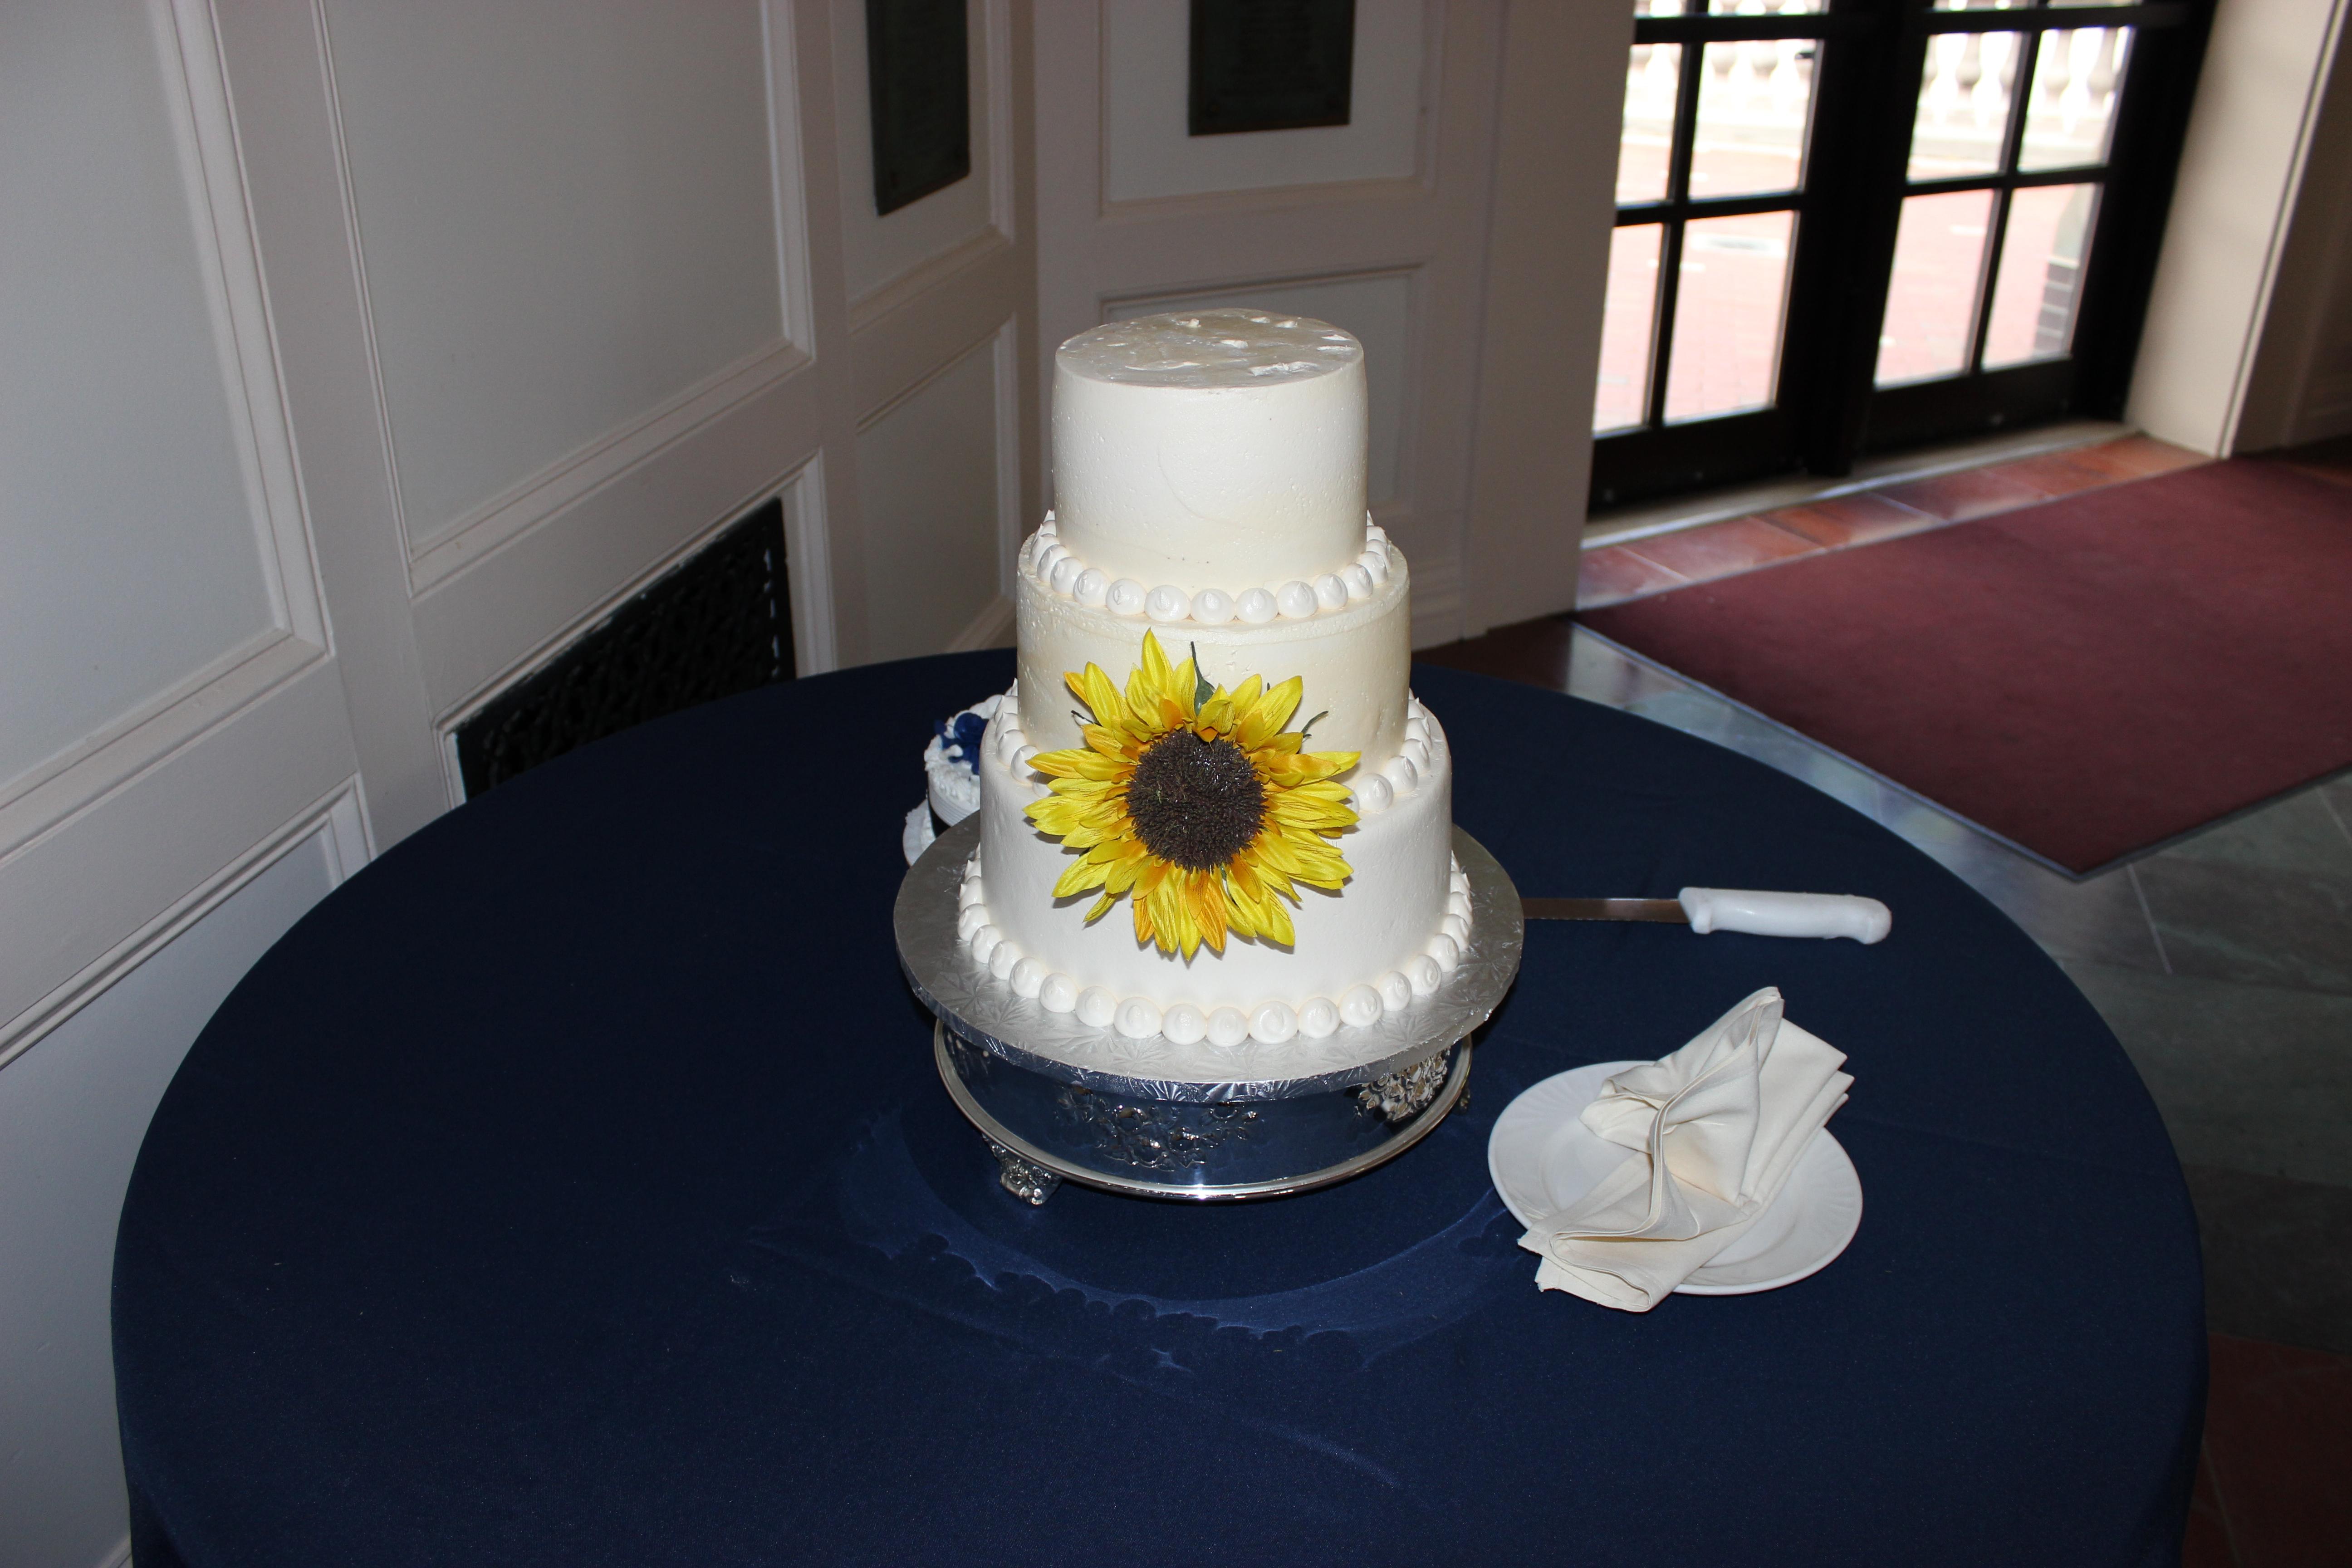 West Point Wedding cake